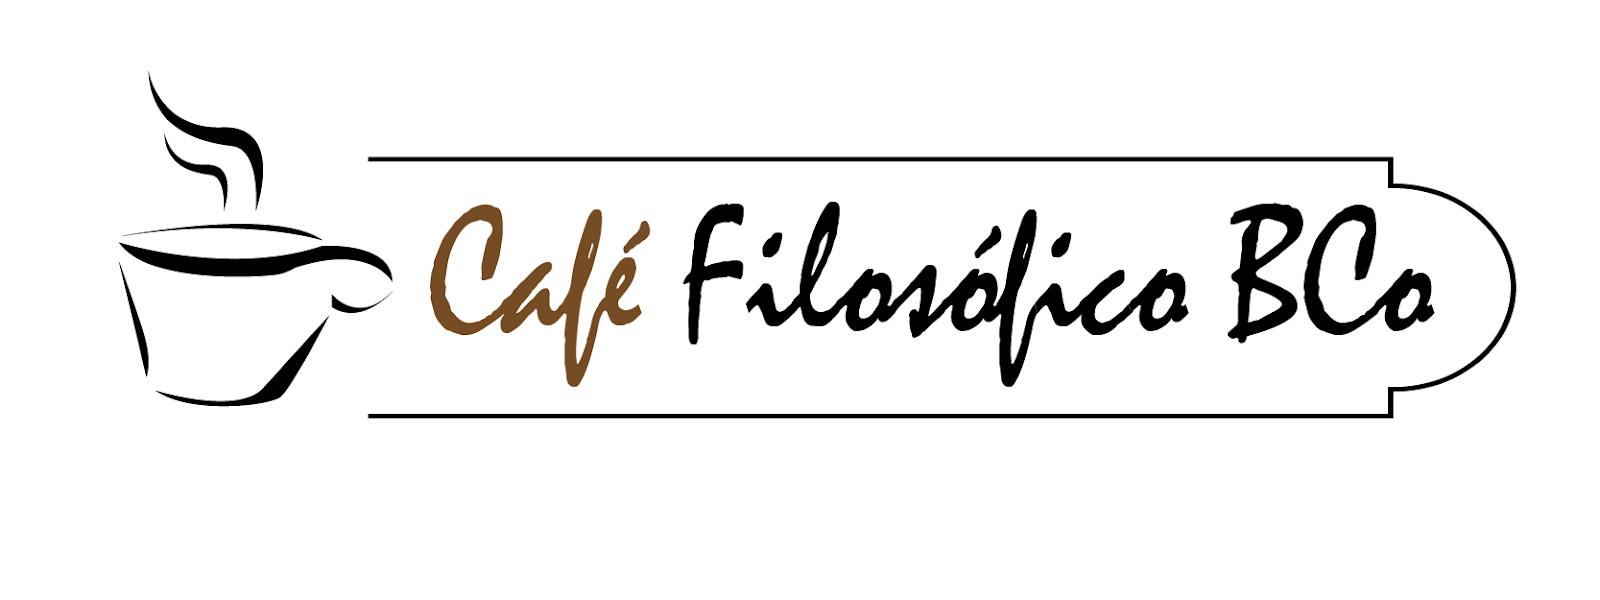 cafefilosofico2-01.png